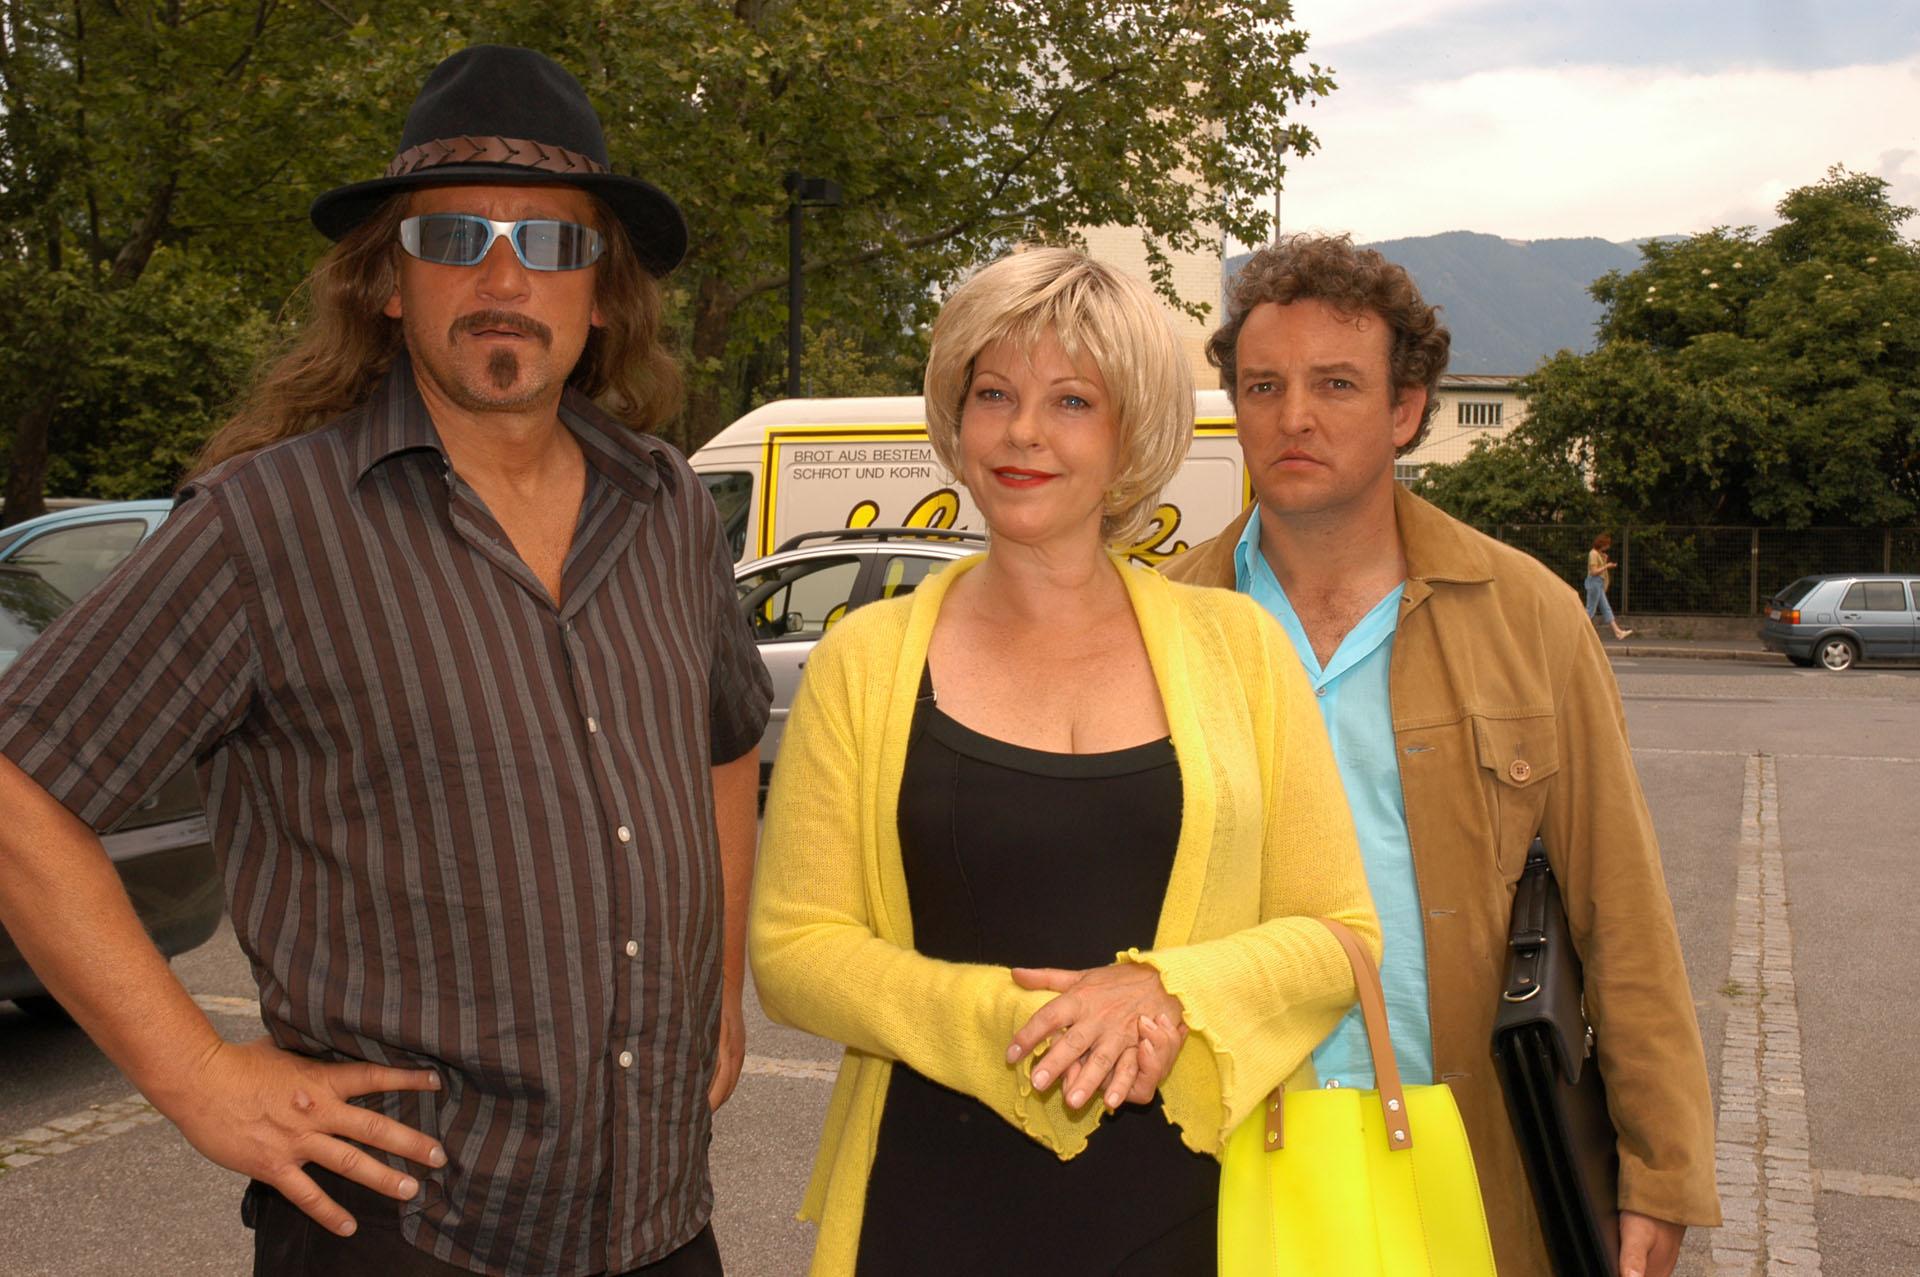 © ORF / Hubert Mican (Star*Film) - Rainhard Fendrich, Elfi Eschke, Marco Rima